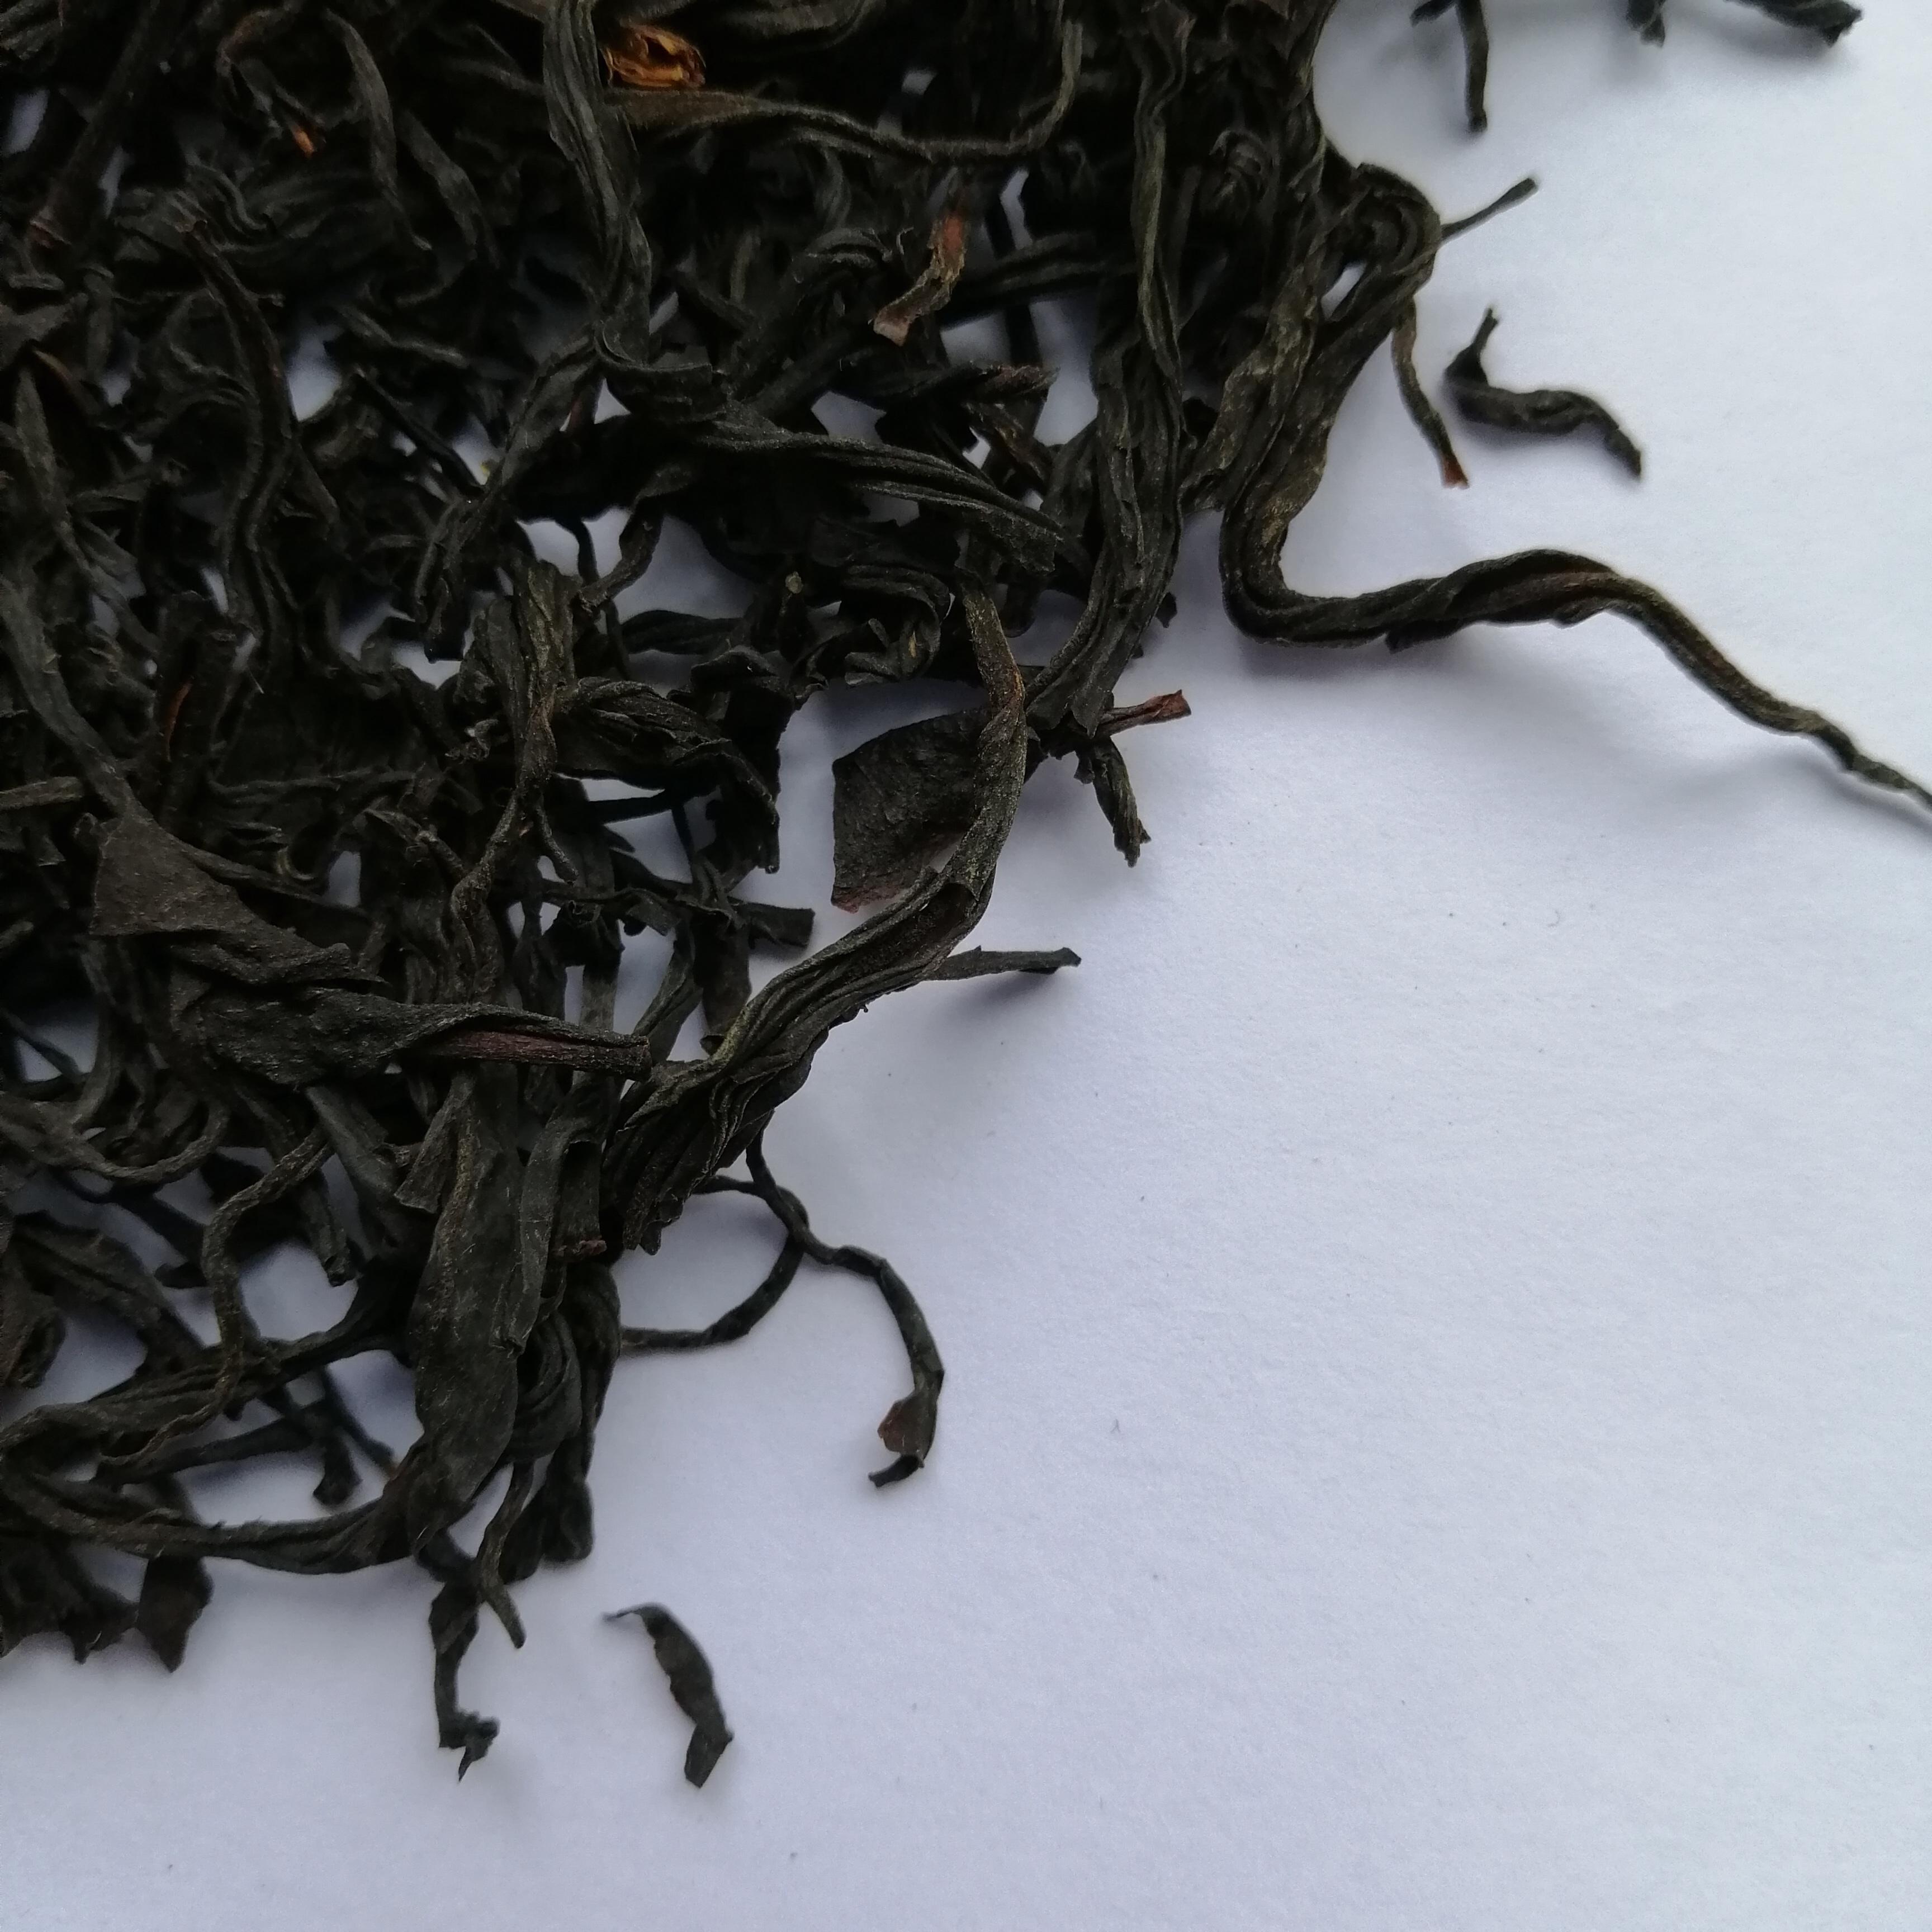 Chinese EU Standard high quality Songluo black tea Chinese black tea leaves - 4uTea | 4uTea.com